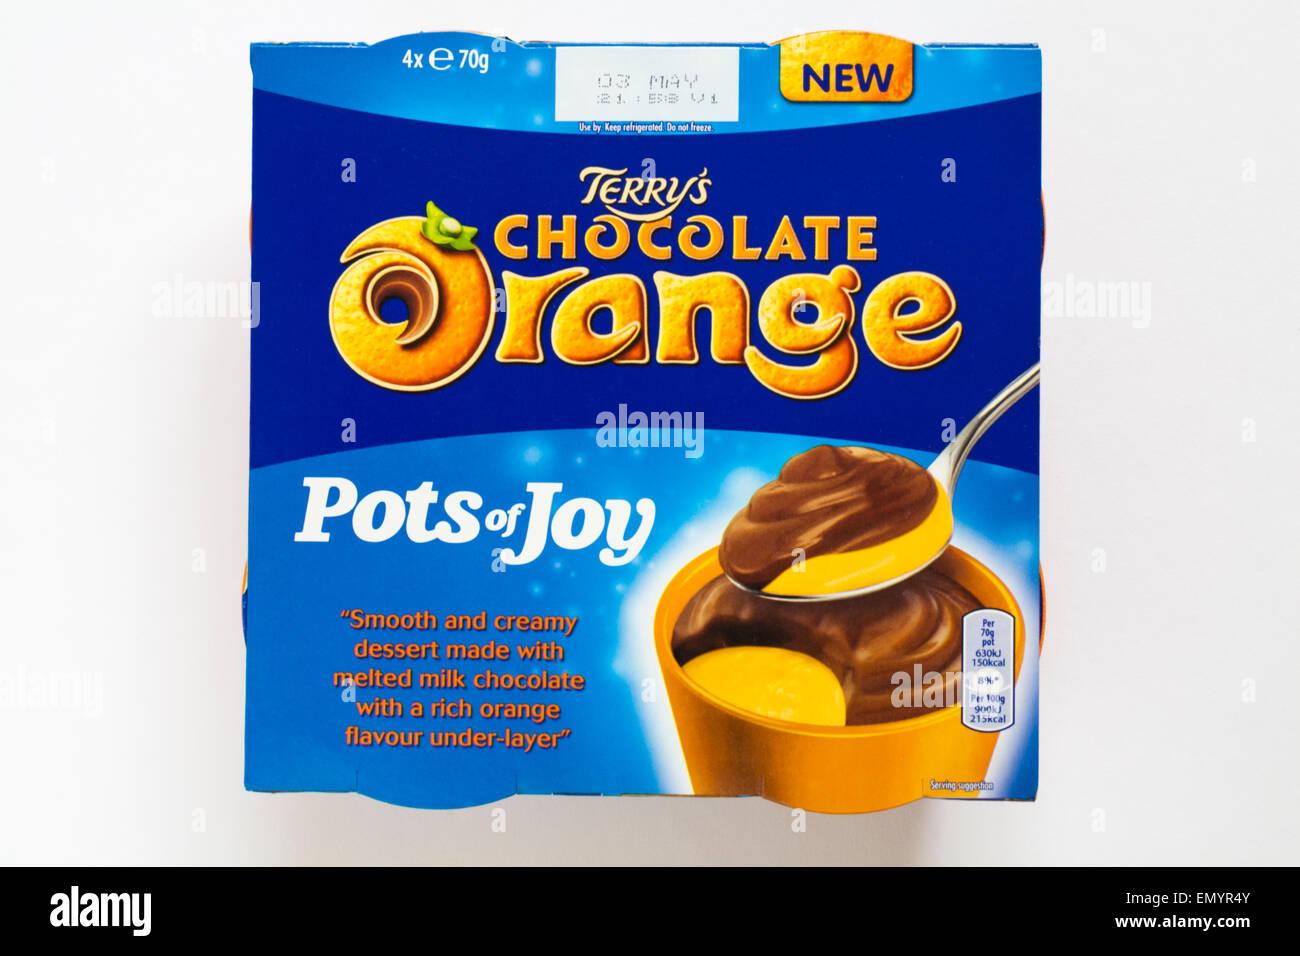 Terrys Chocolate Orange Pots Of Joy Isolated On White